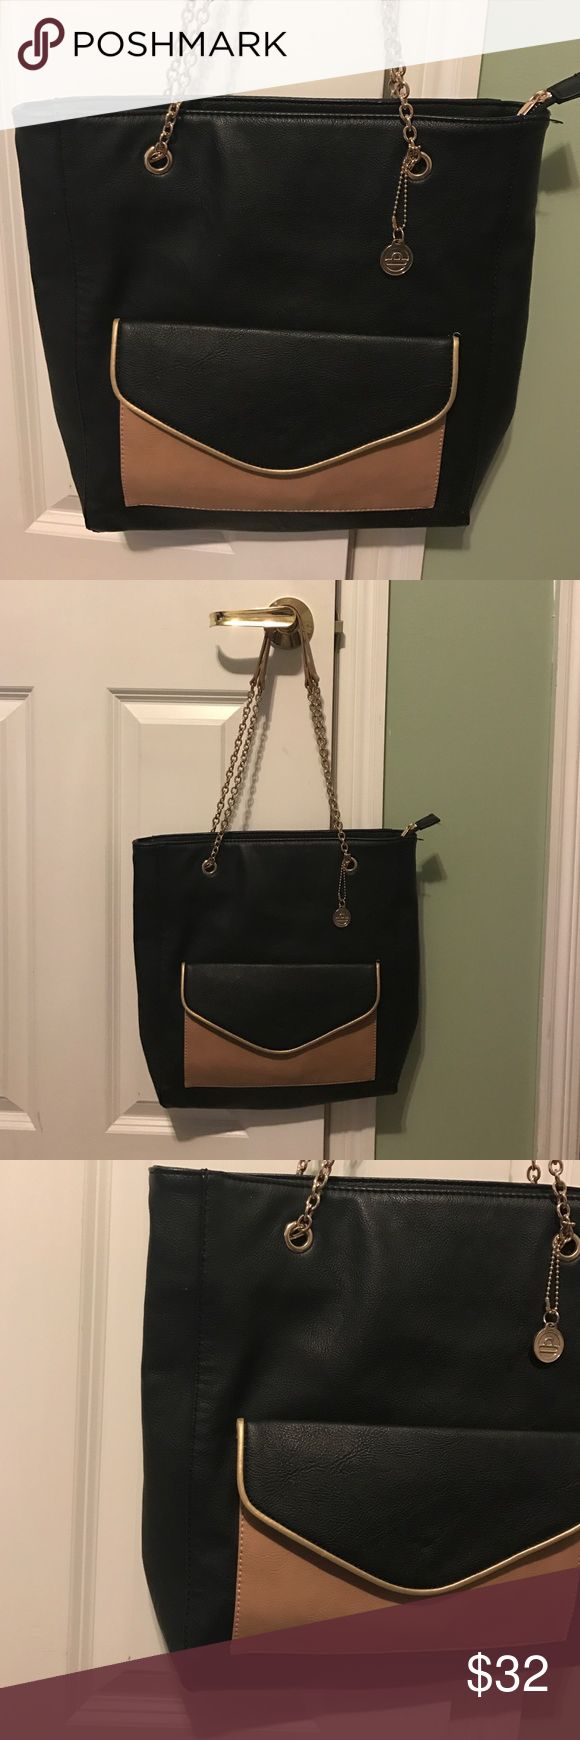 Big Buddha purse. Brown/black/gold colored handbag. Gently used.  Zipper section inside. Big Buddha Bags Shoulder Bags